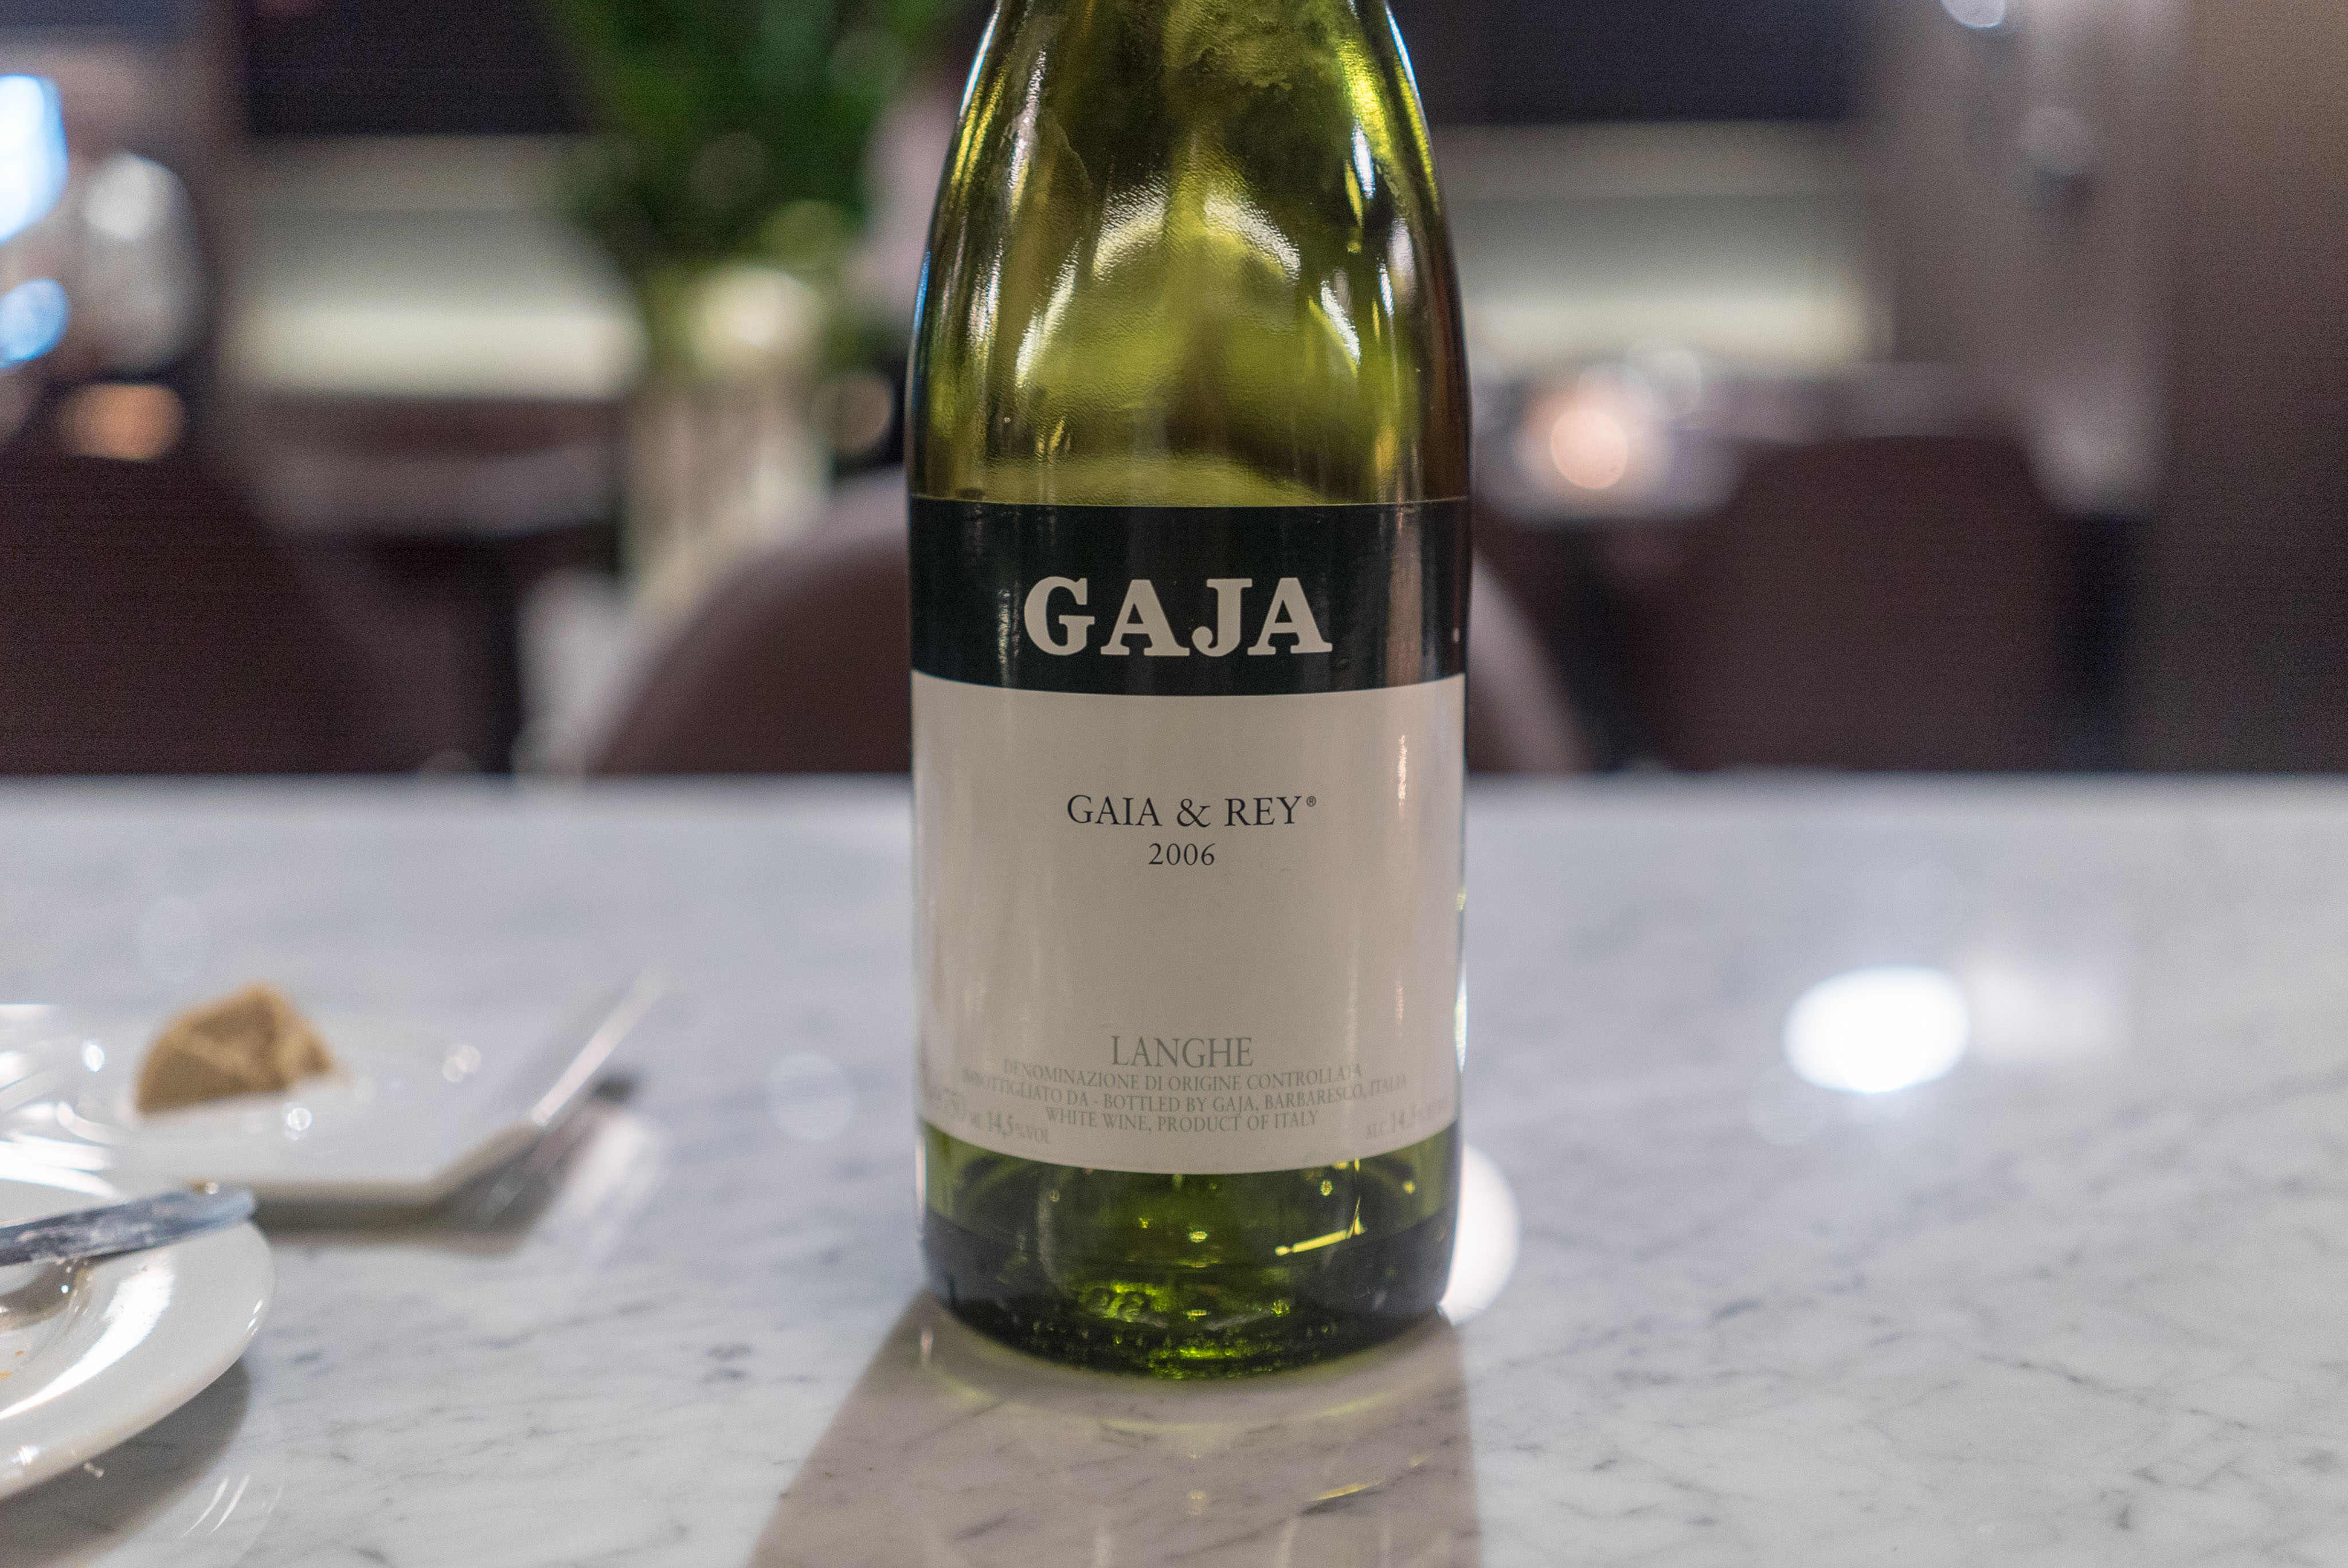 Gaja Gaia & Rey Langhe 2006